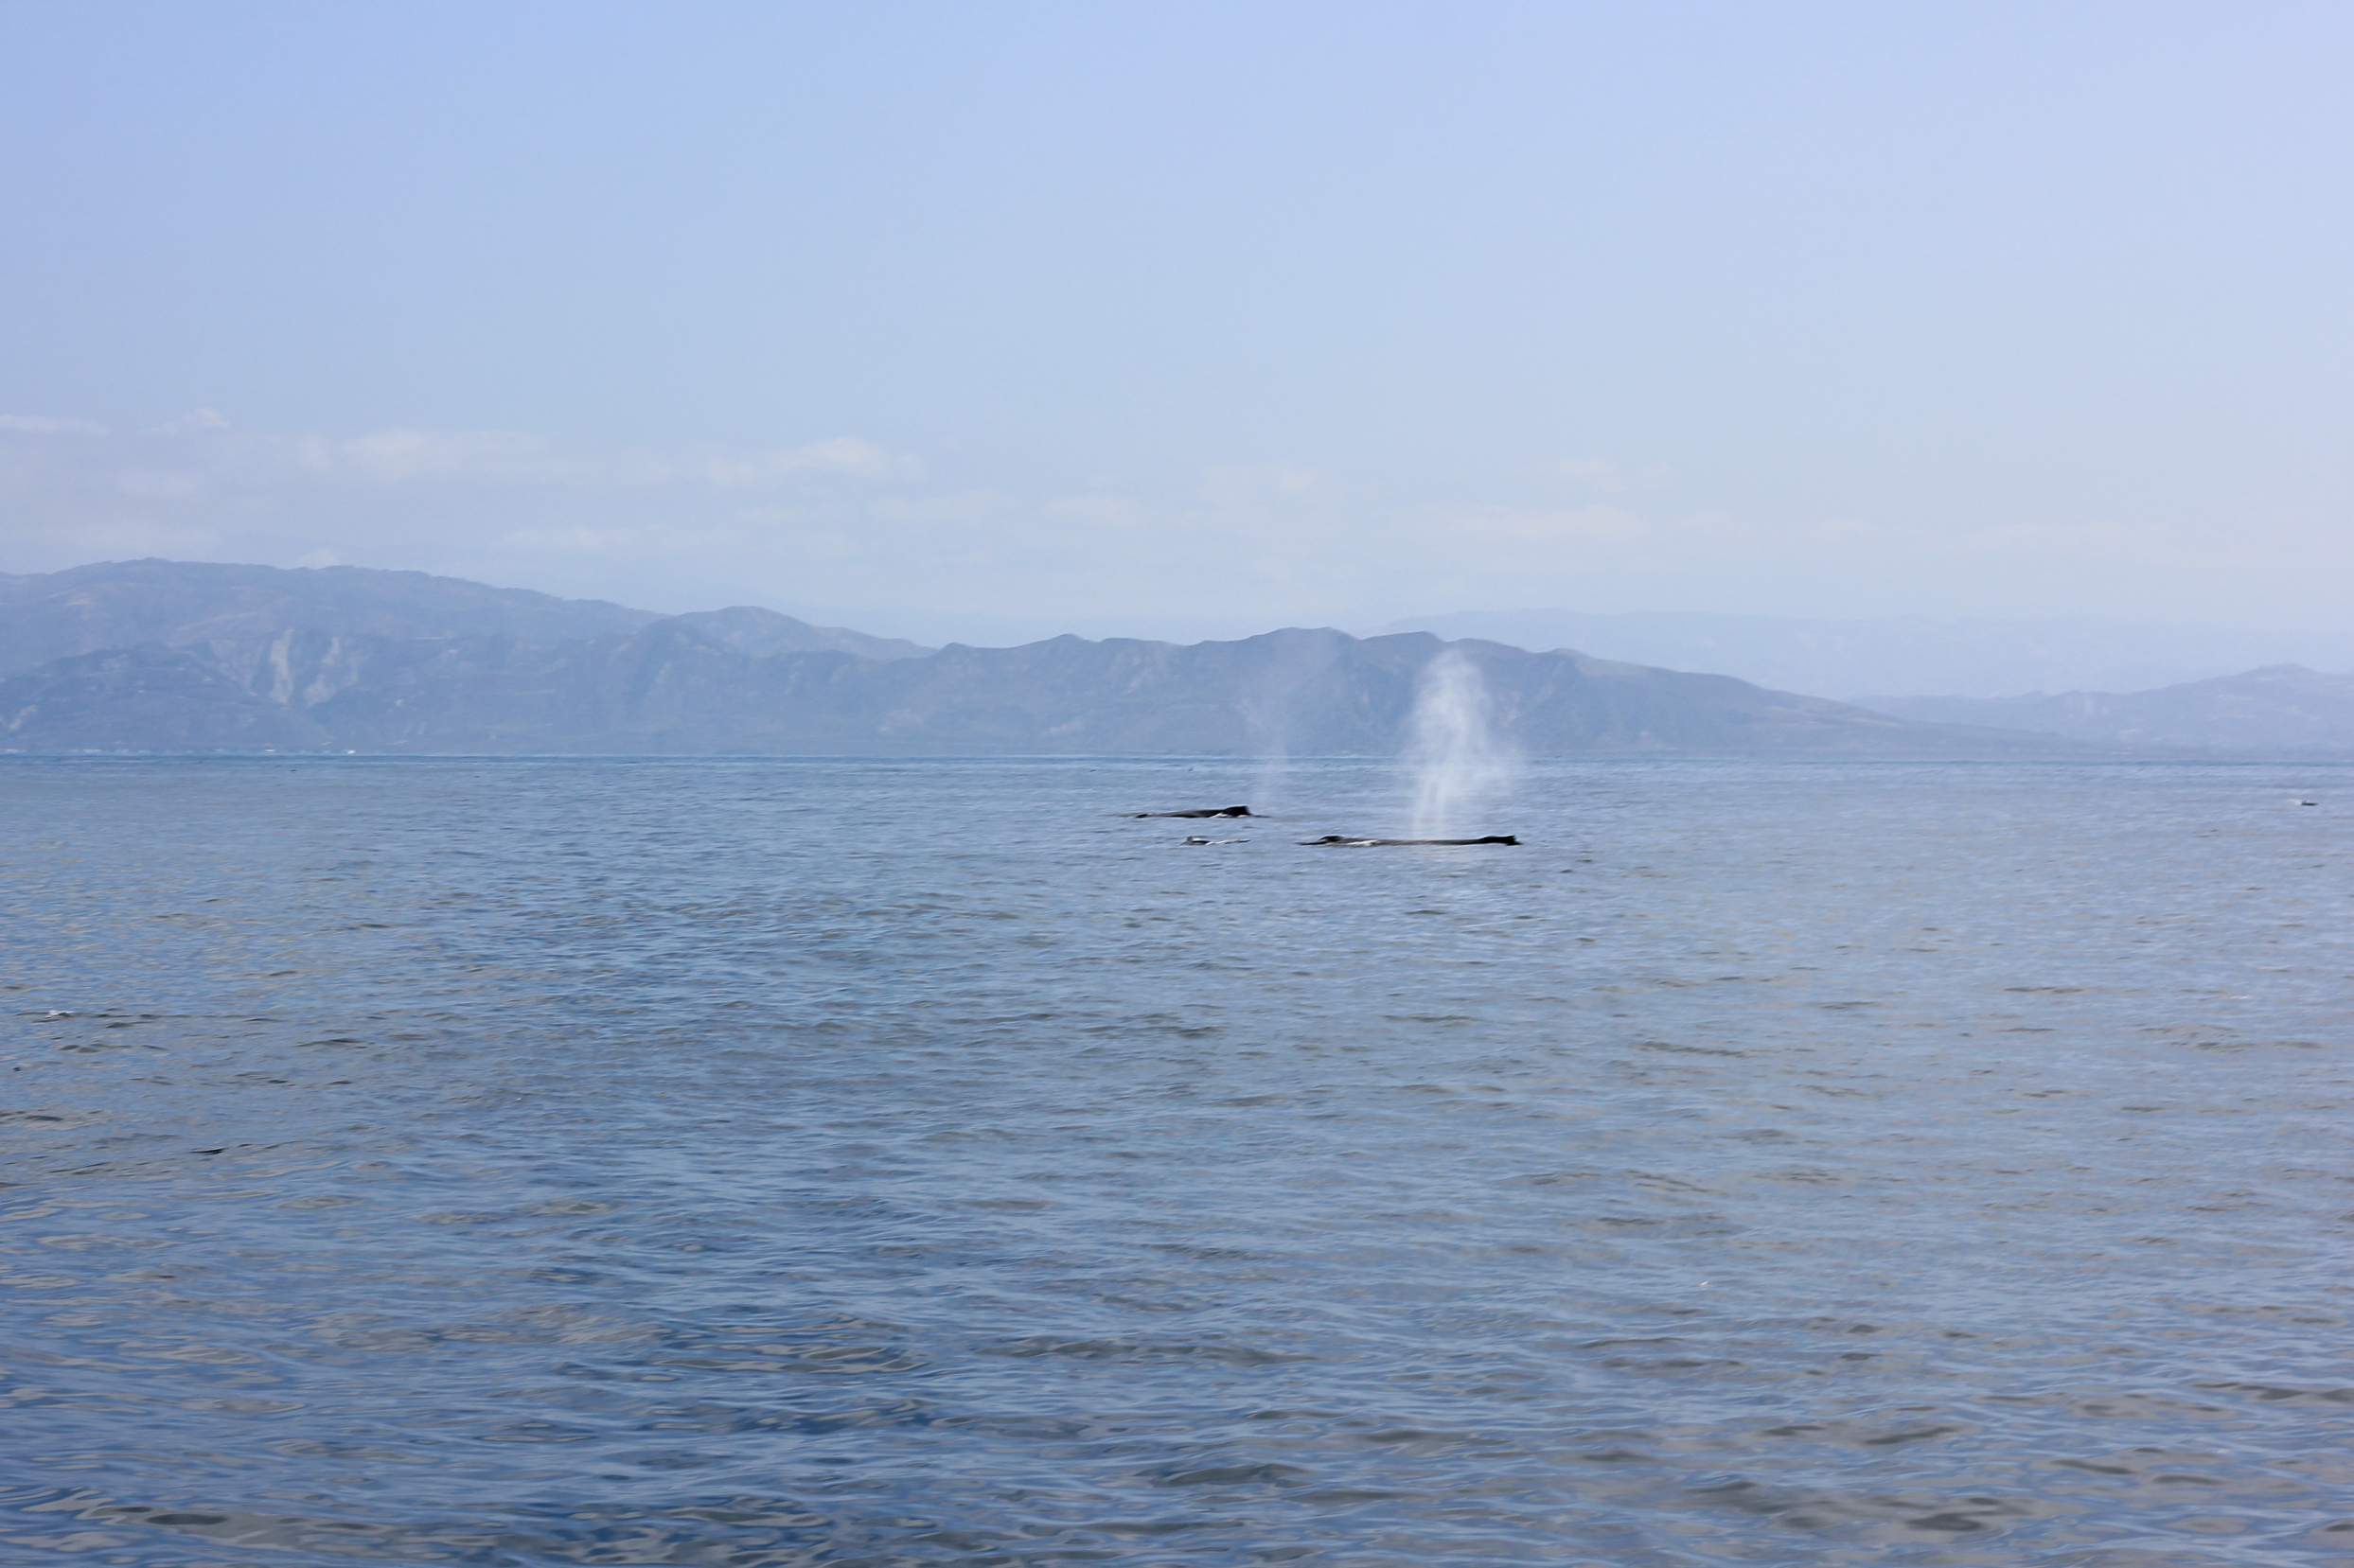 More whales swimming alongside Agape.